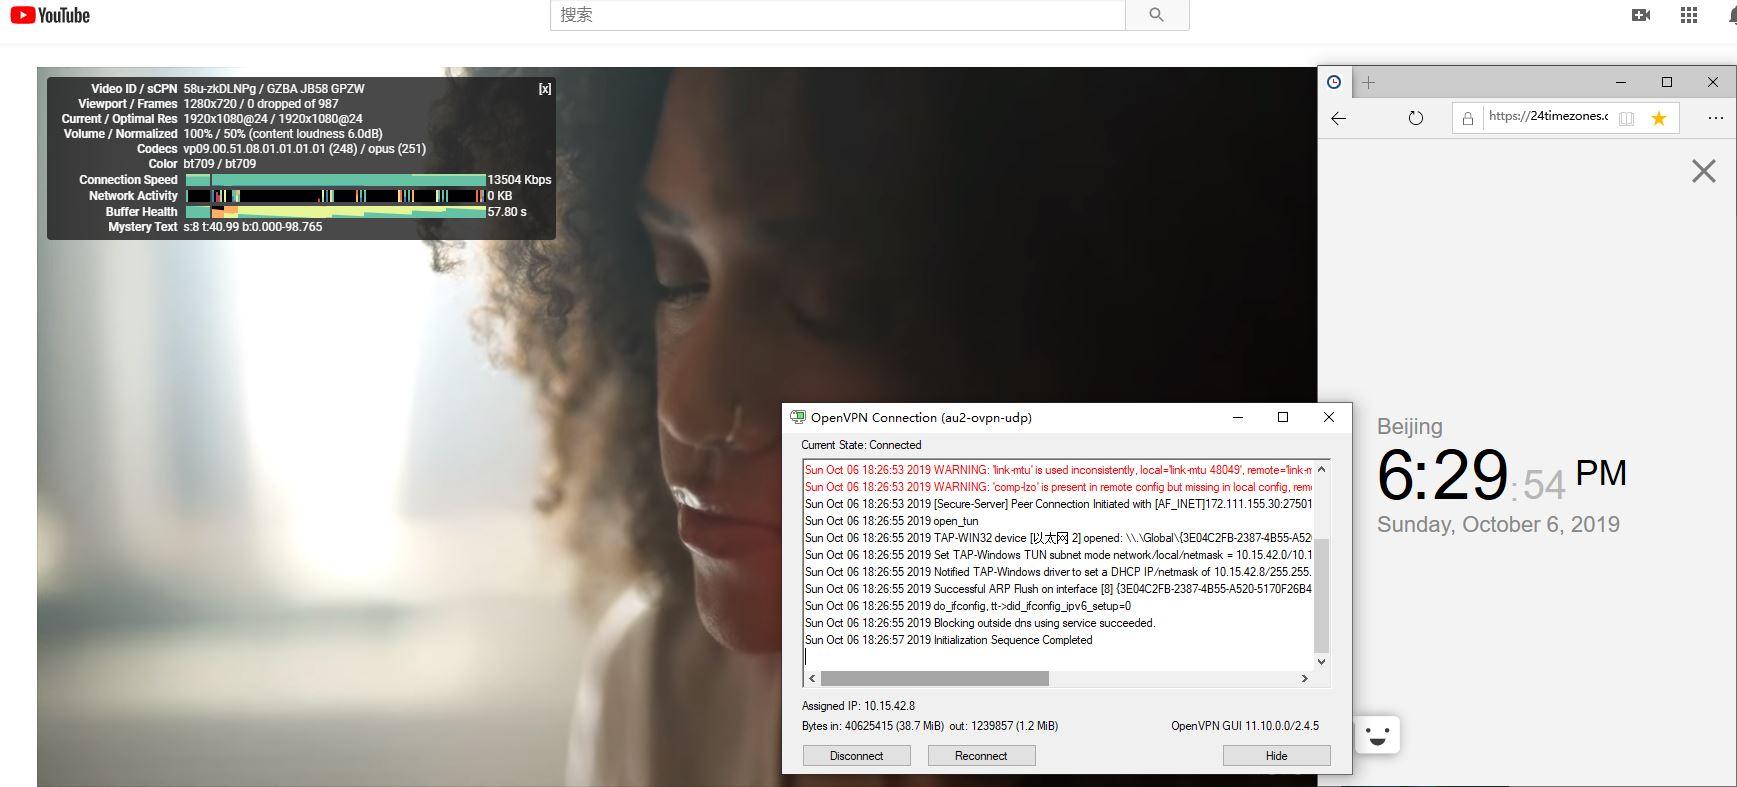 Windows IvacyVPN OPENVPN GUI -AU2 中国VPN翻墙 科学上网 YouTube测速-20191006